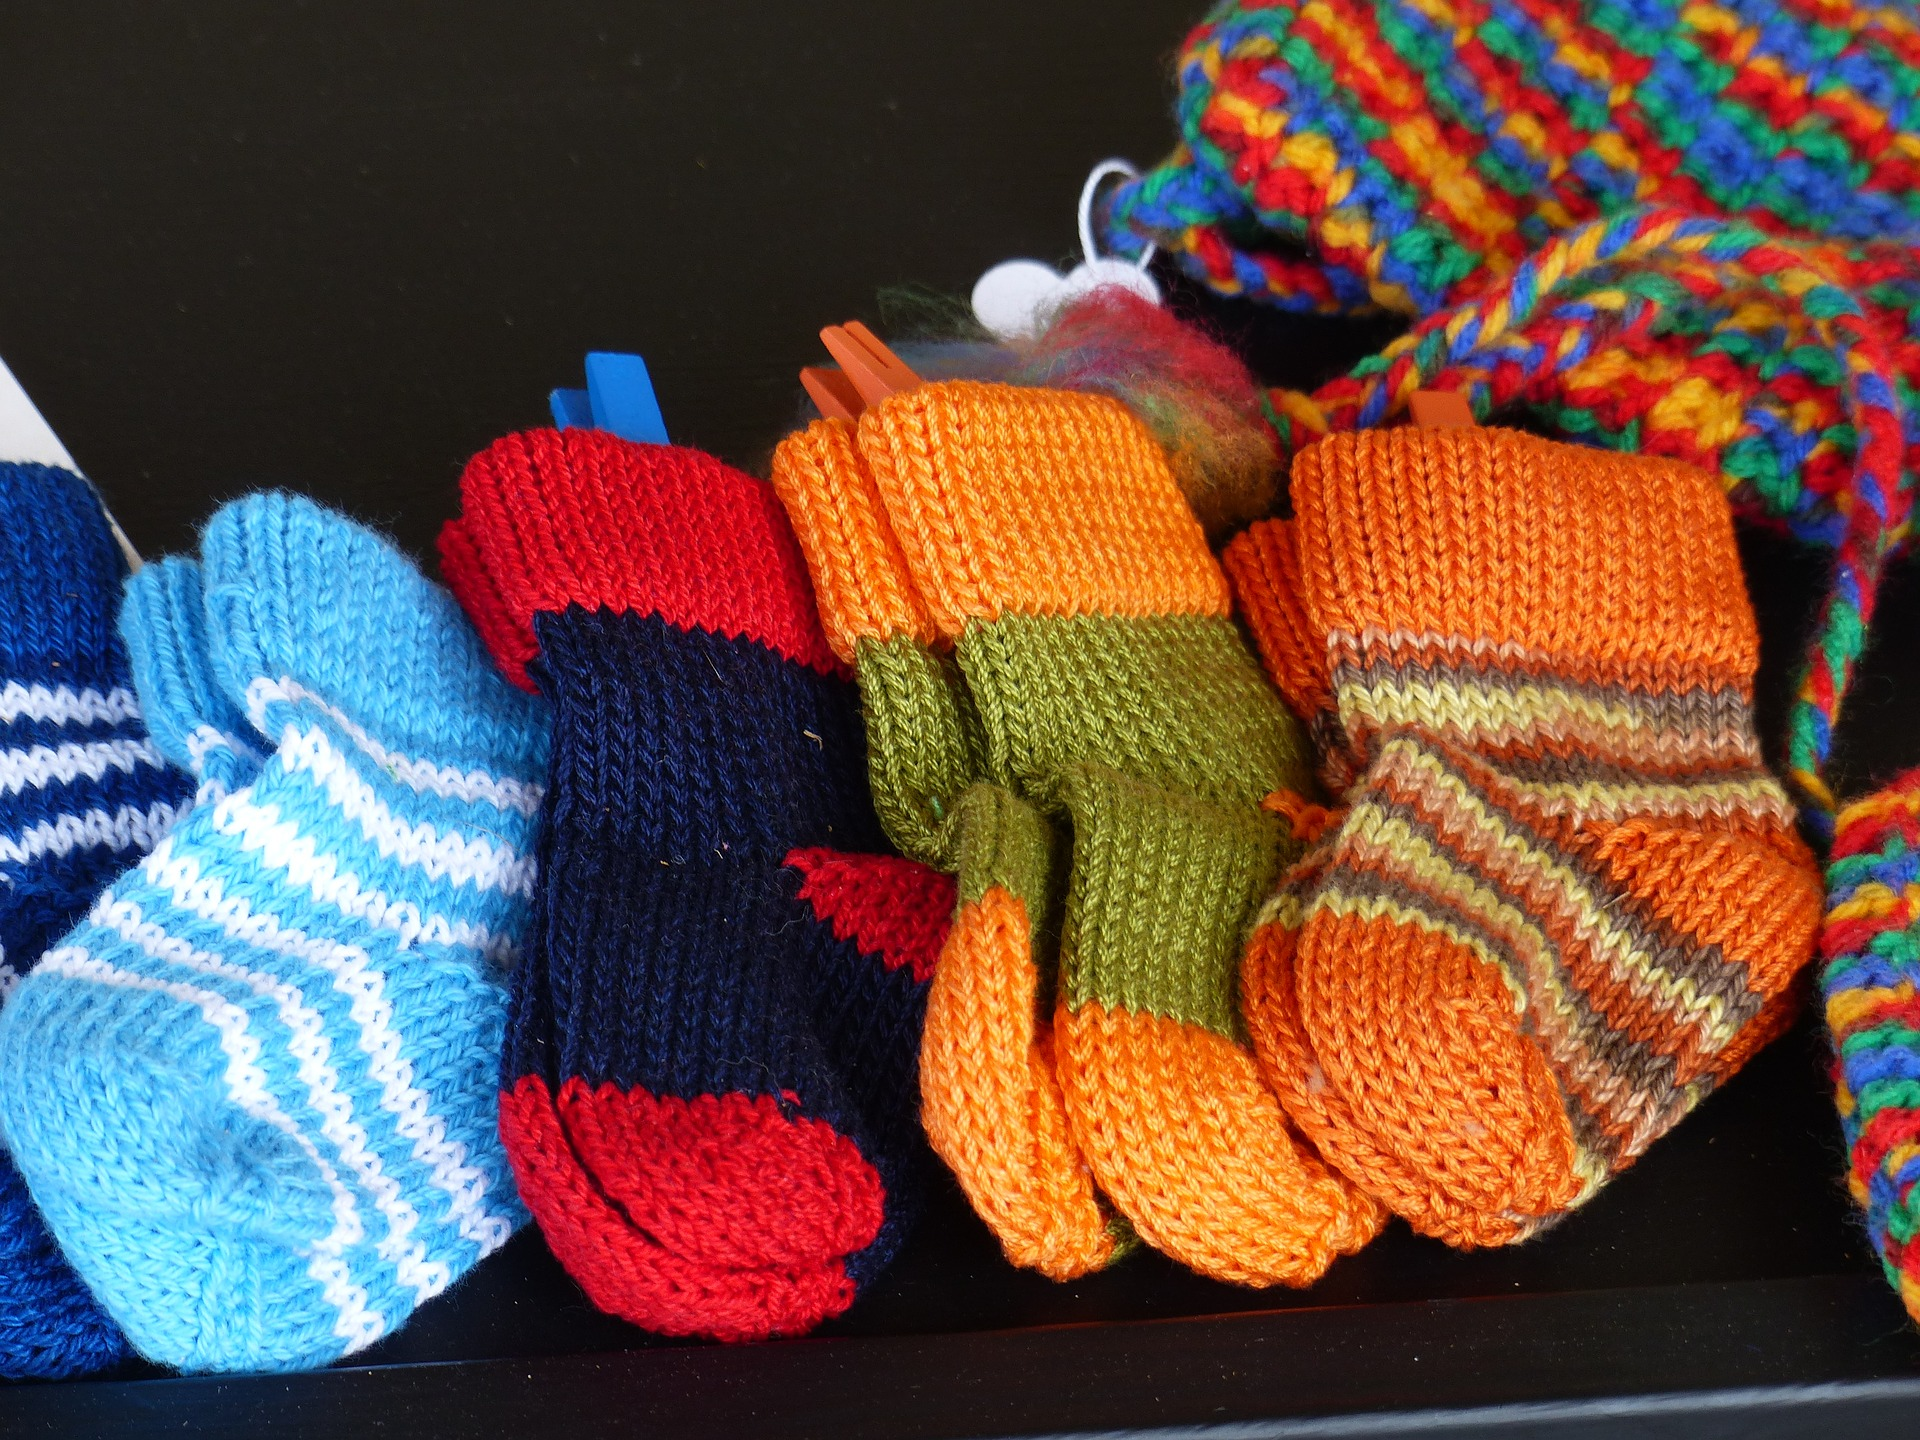 socks-3144491_1920